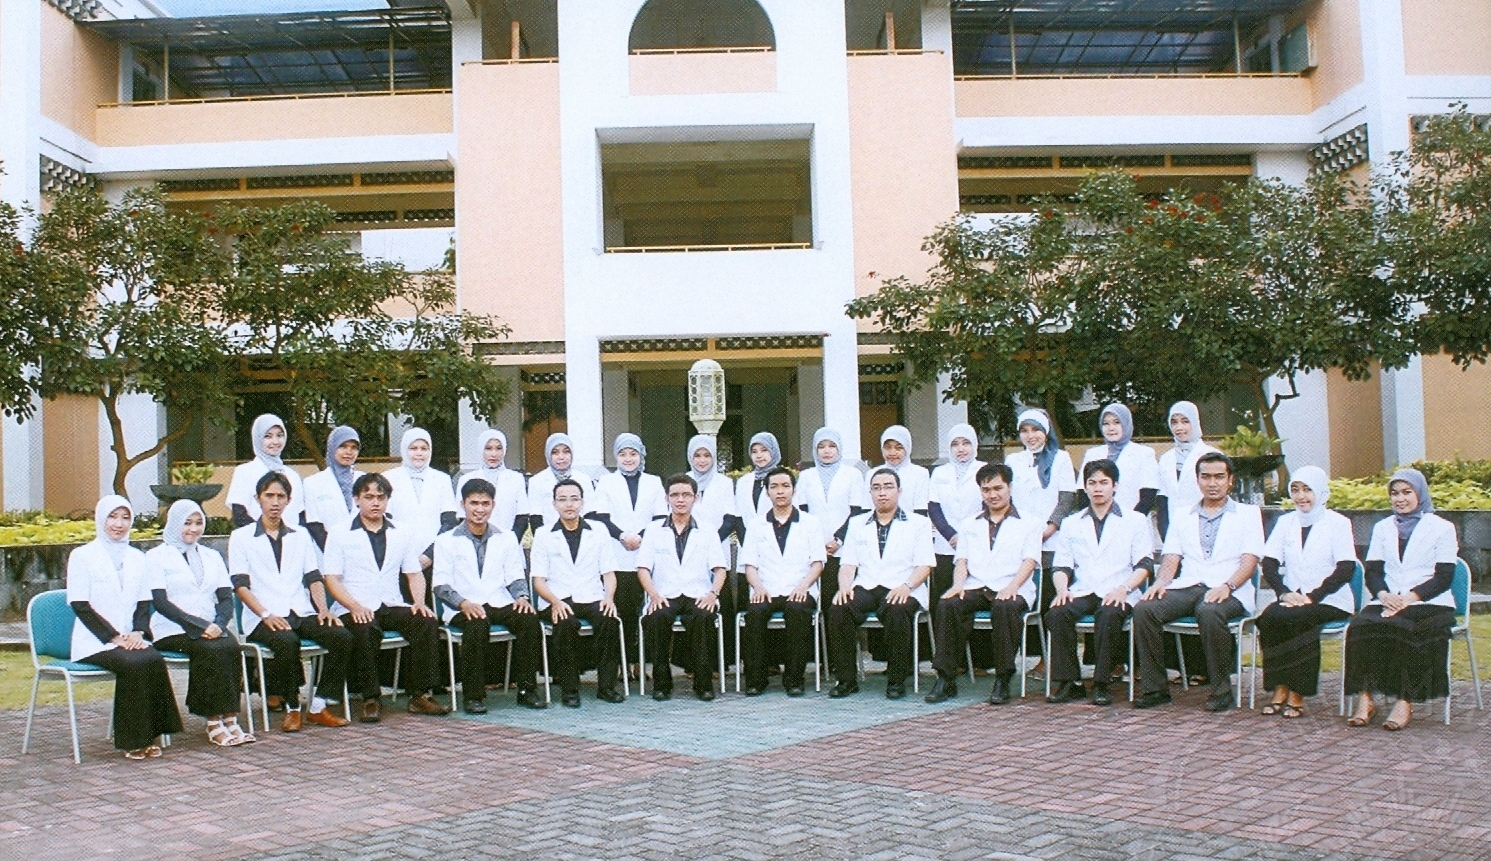 dokter gigi angkatan pertama. Dalam acara ini terdapat 30 dokter ...